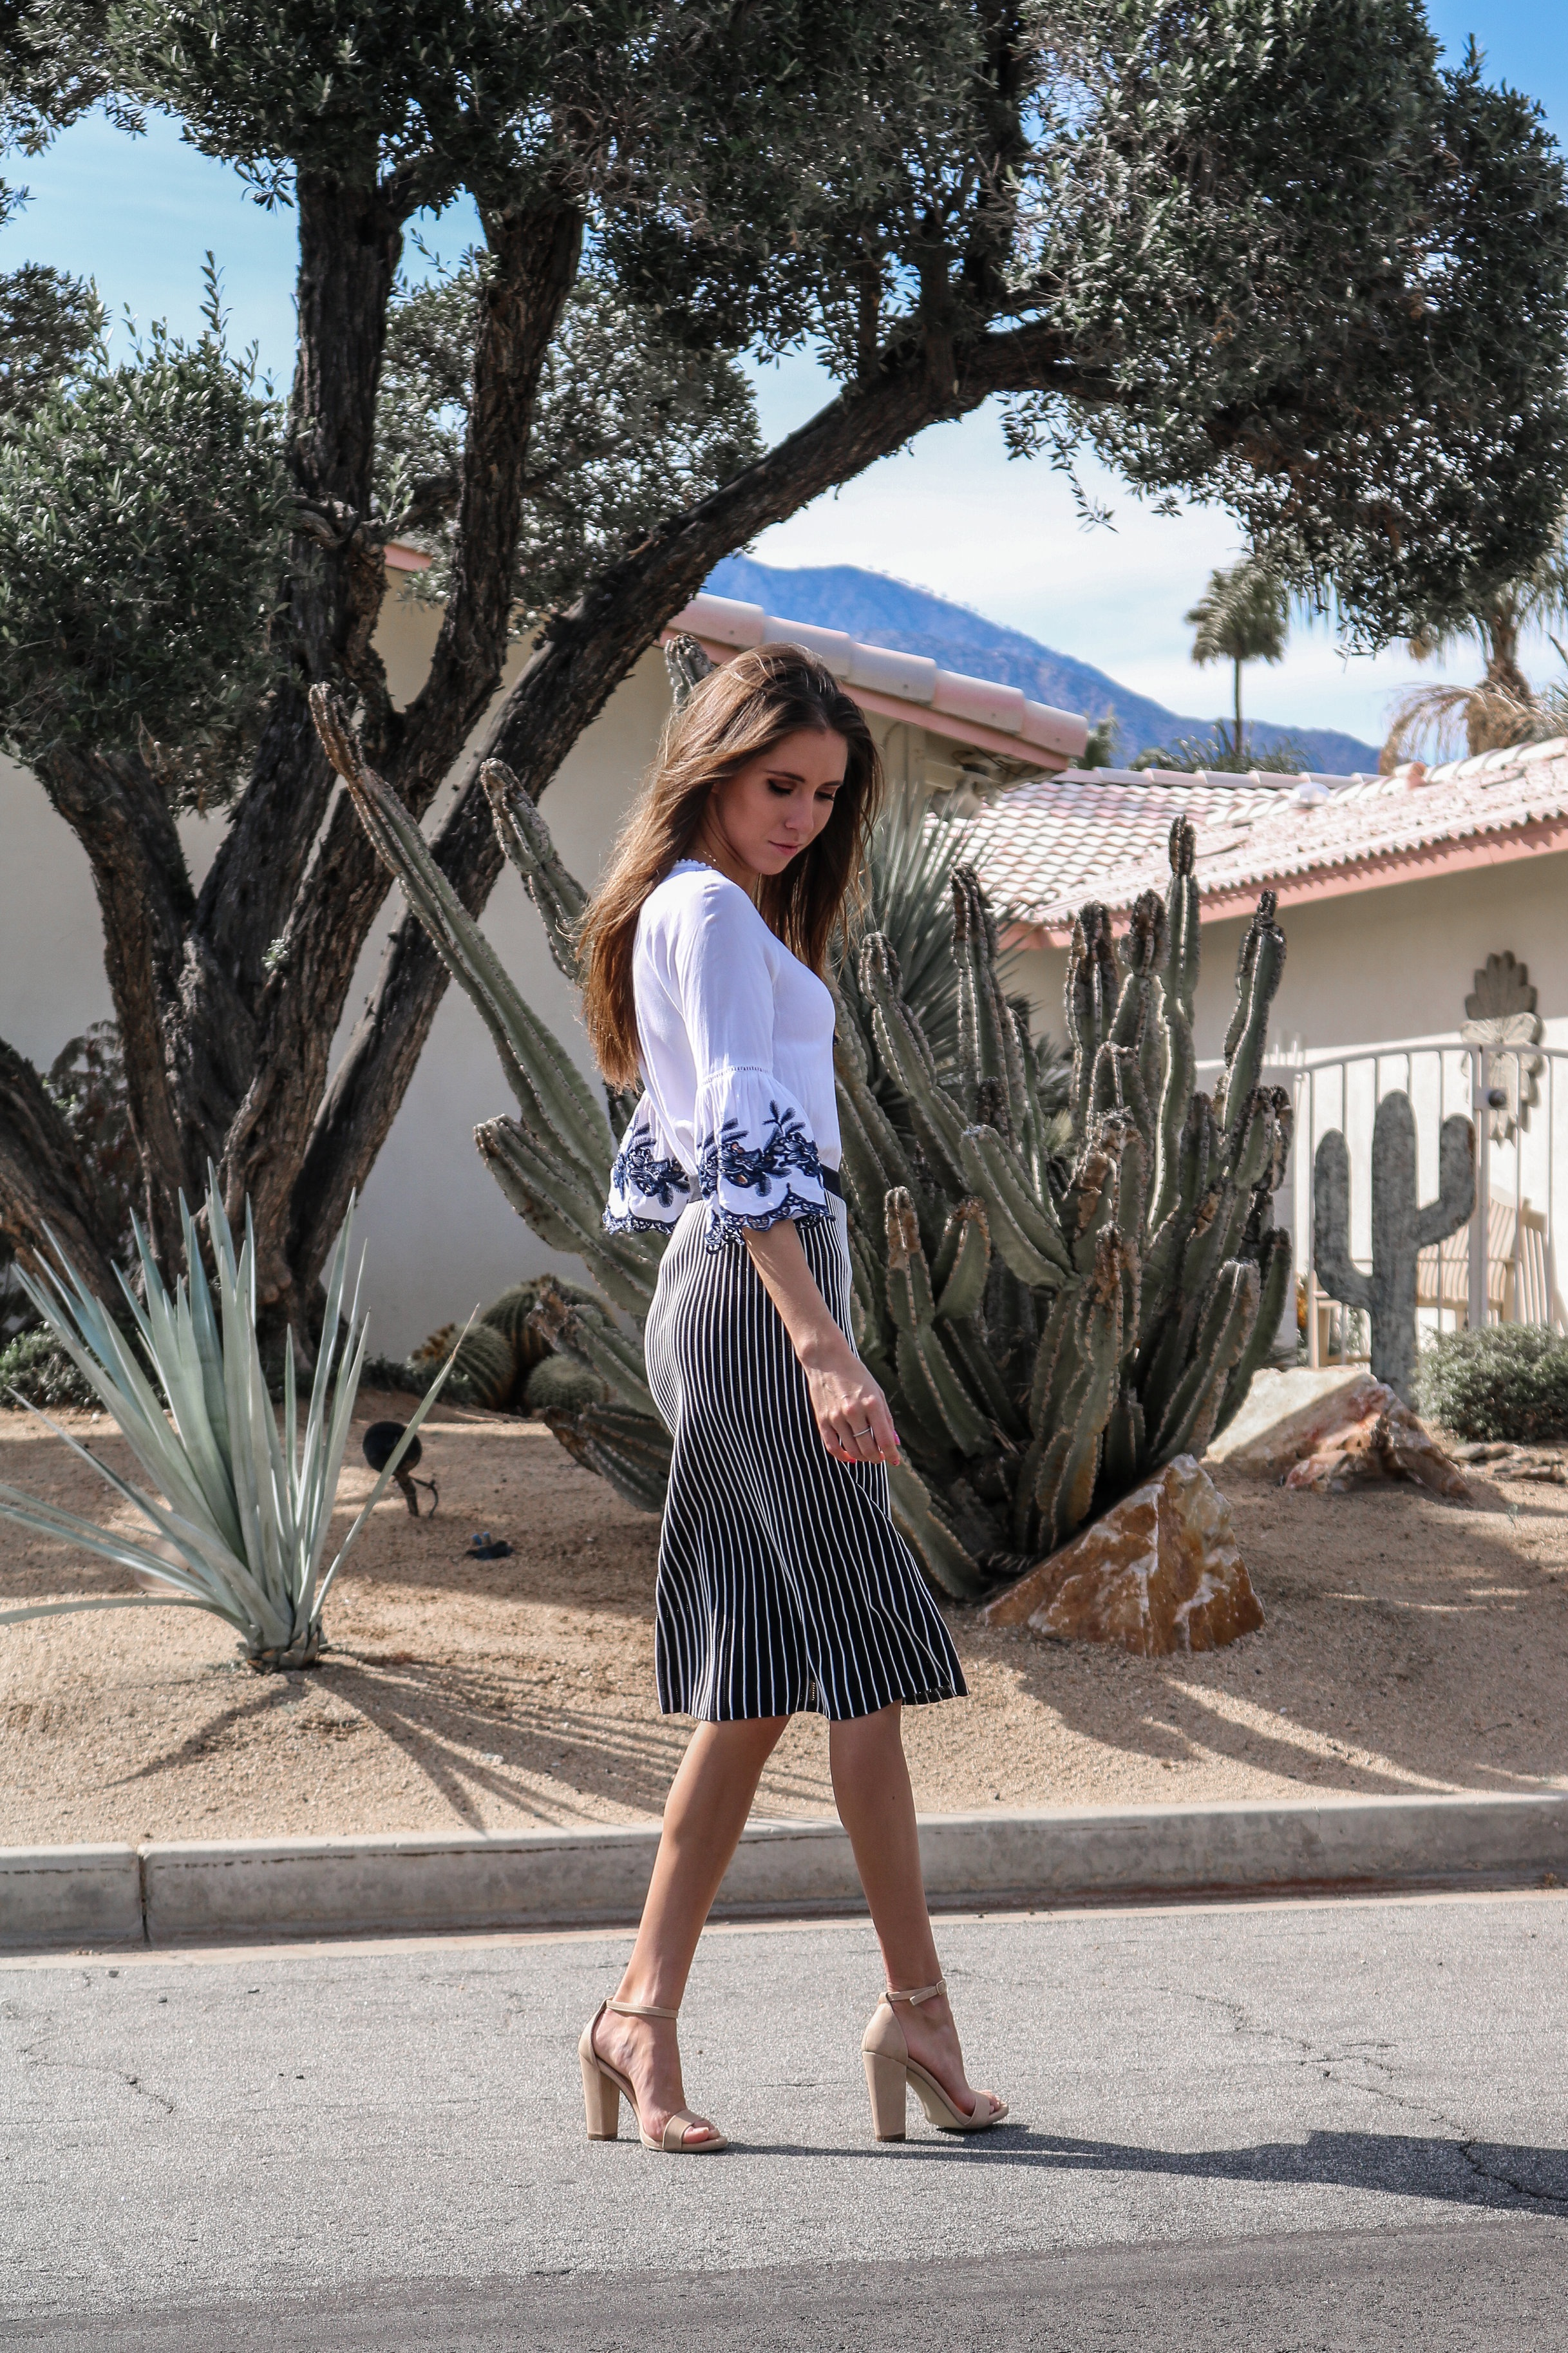 The+Hungarian+Brunette+OOTD+midi+skirt+and+embroidered+bell+sleeves+%288+of+12%29.jpg